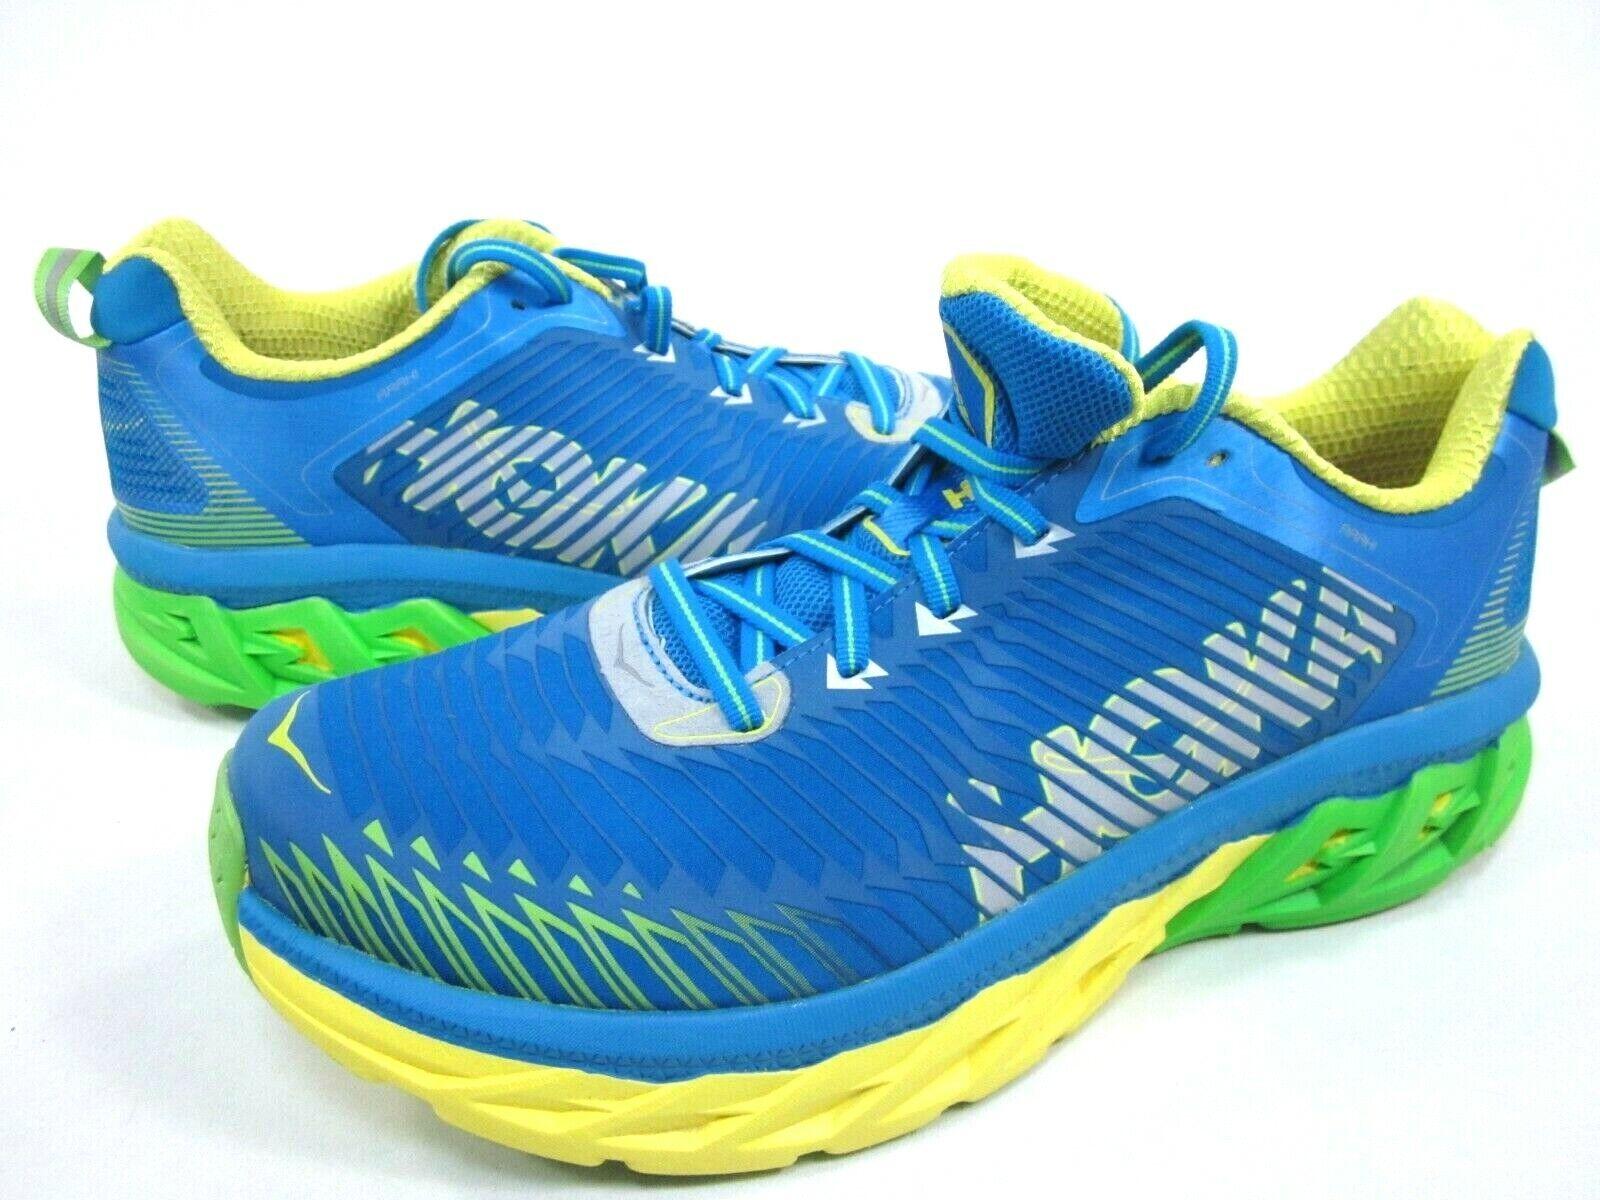 HOKA ONE Hombre Zapatos Deportivos ARAHI ONE, Azul Aster amarillo, US tamaño mediano 12,